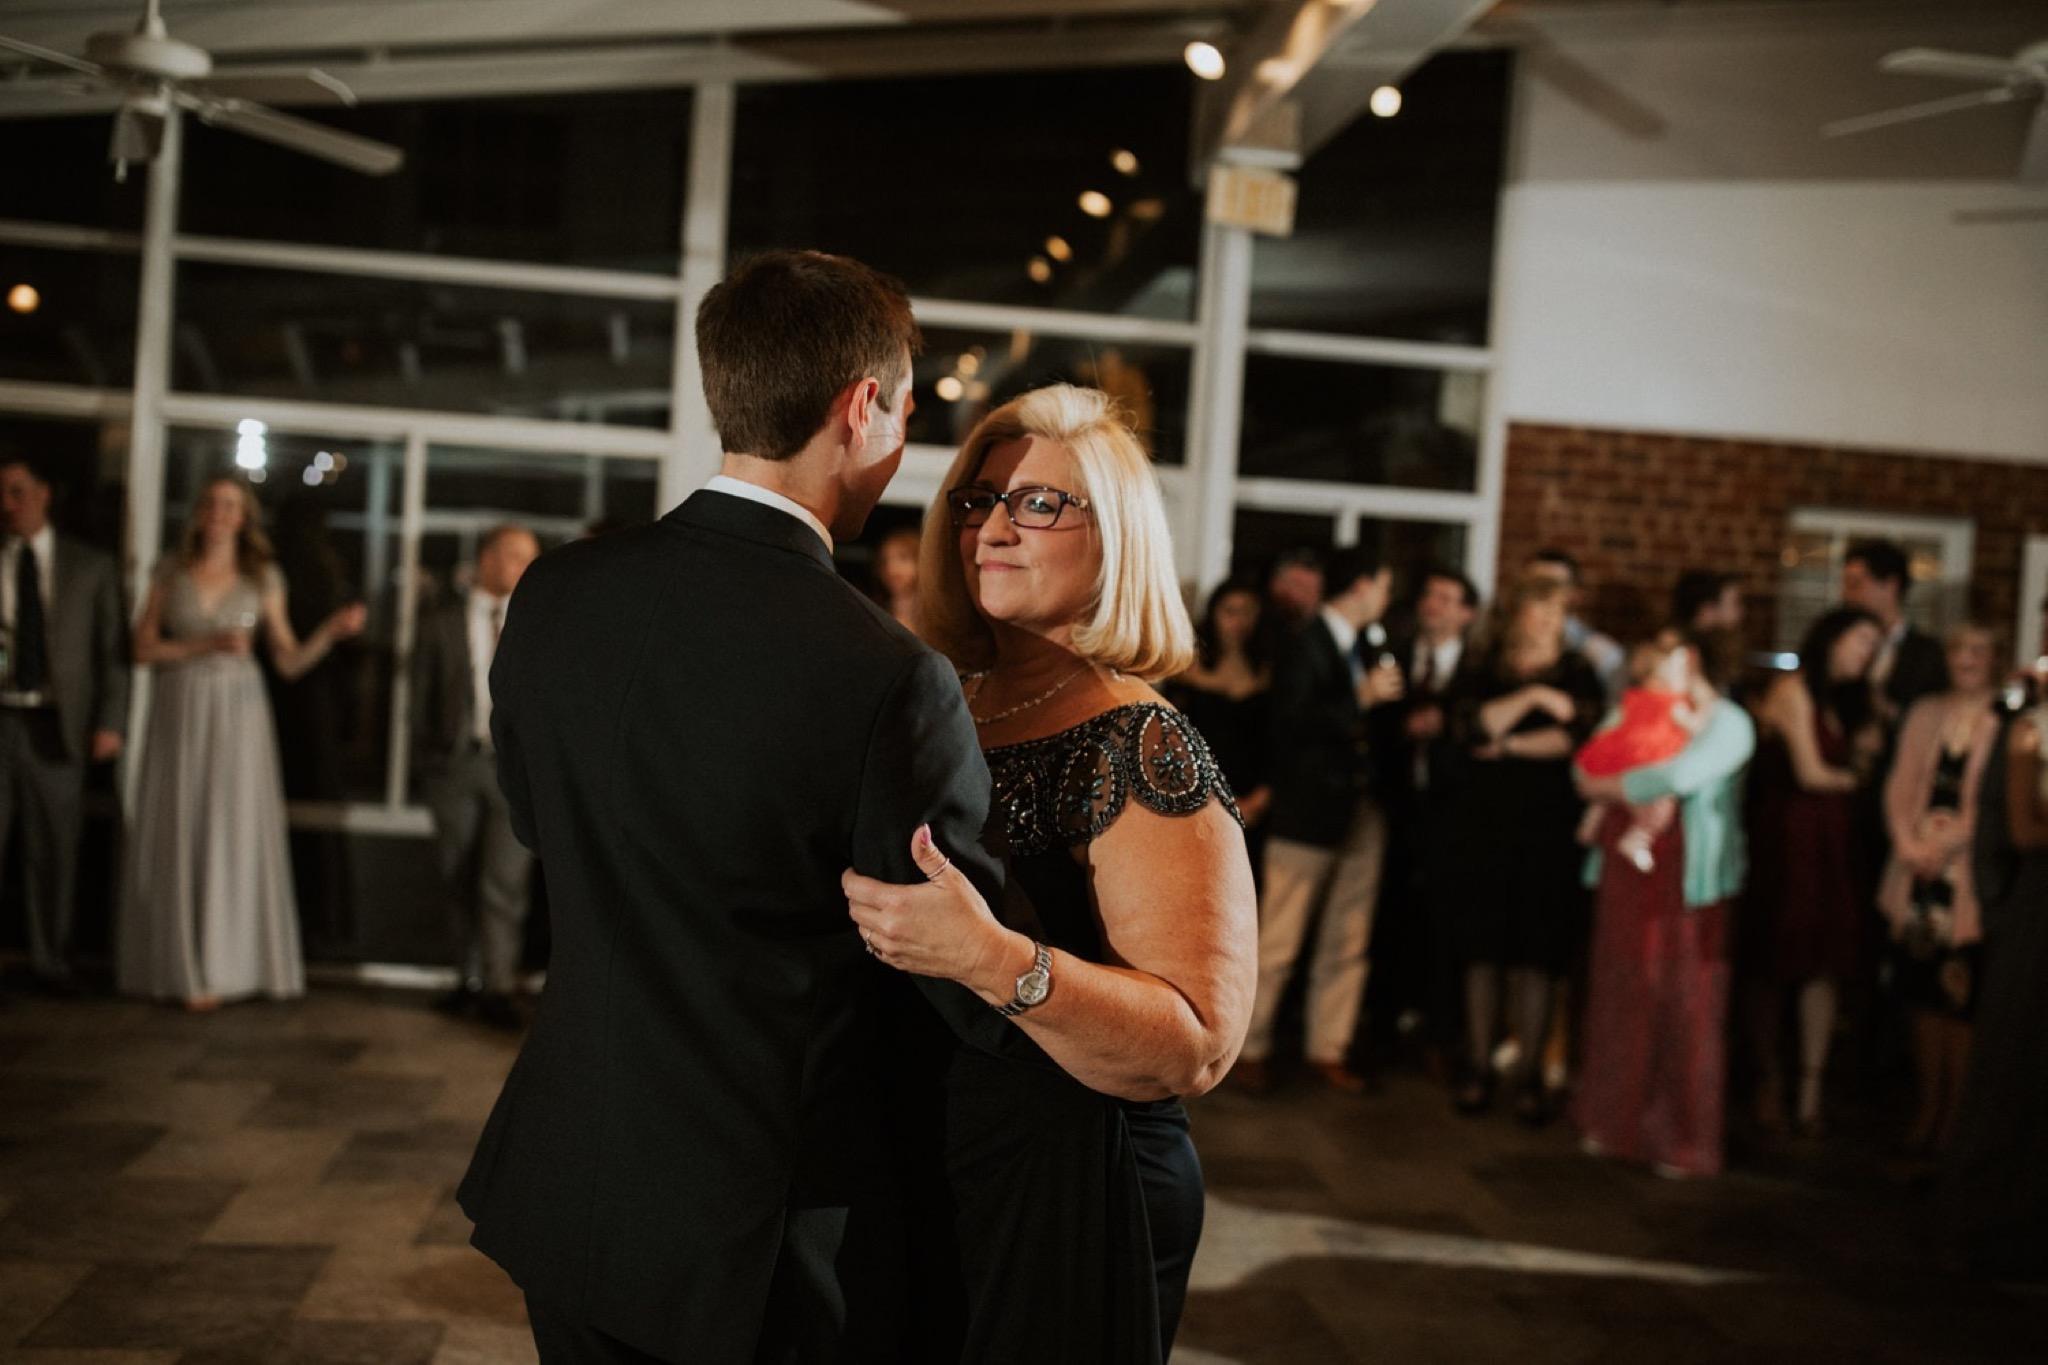 86_West Manor Estate Weddings - Pat Cori Photography-193_Weddingvenue_dancing_VirginiaWeddingPhotographer_WestManorEstate_reception_Wedding.jpg